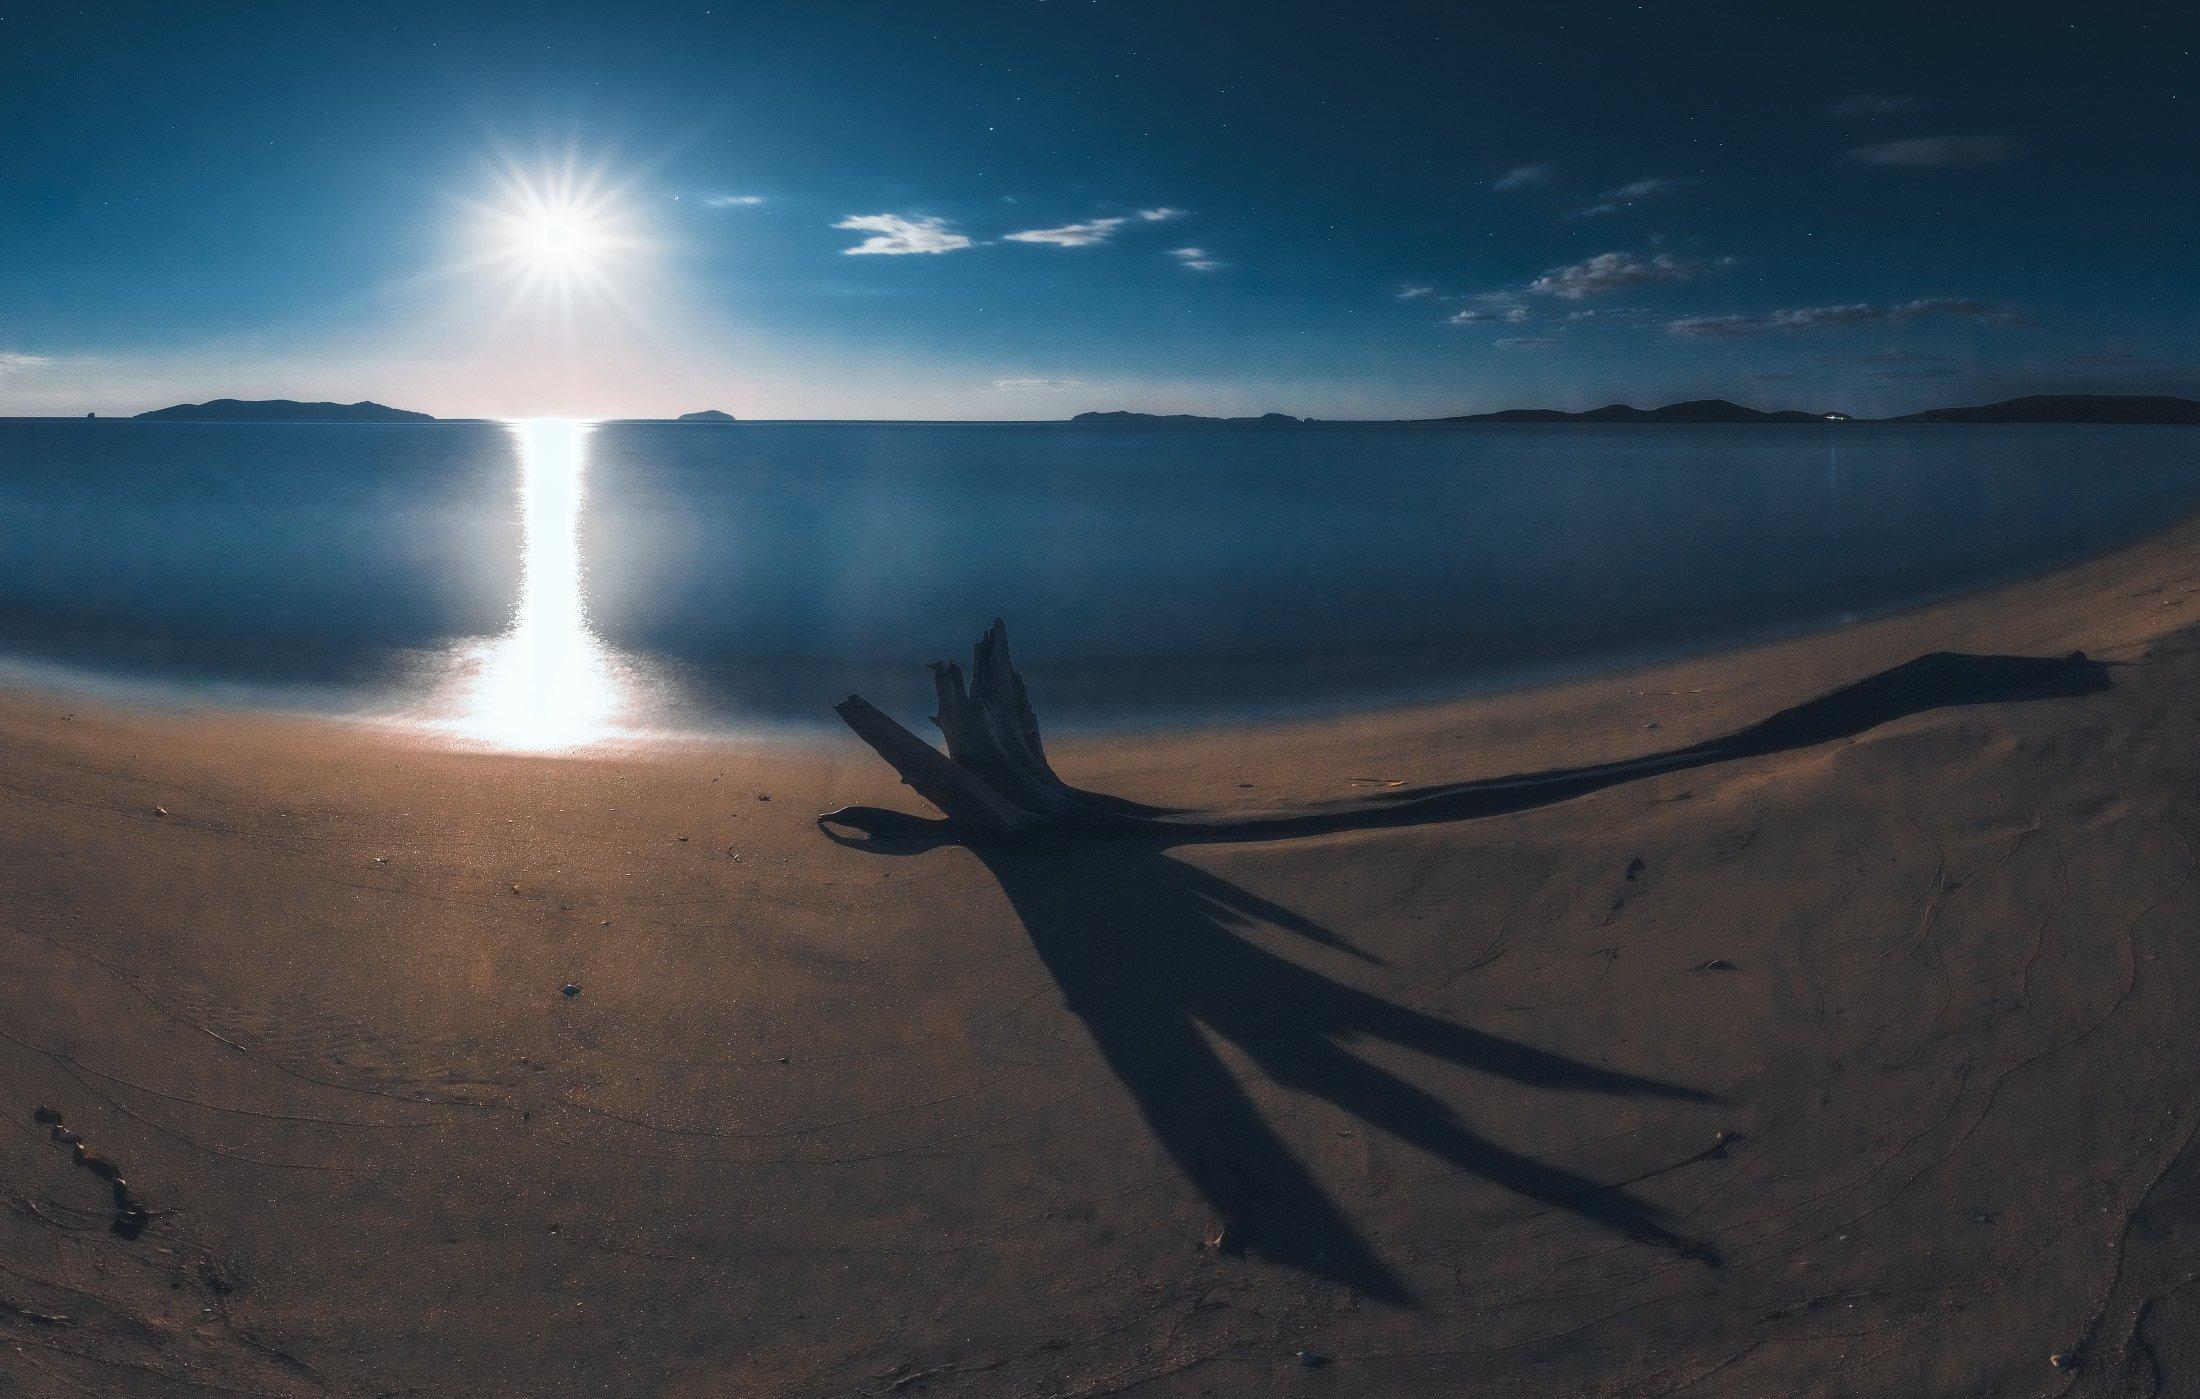 панорама, ночь, море, луна, Андрей Кровлин